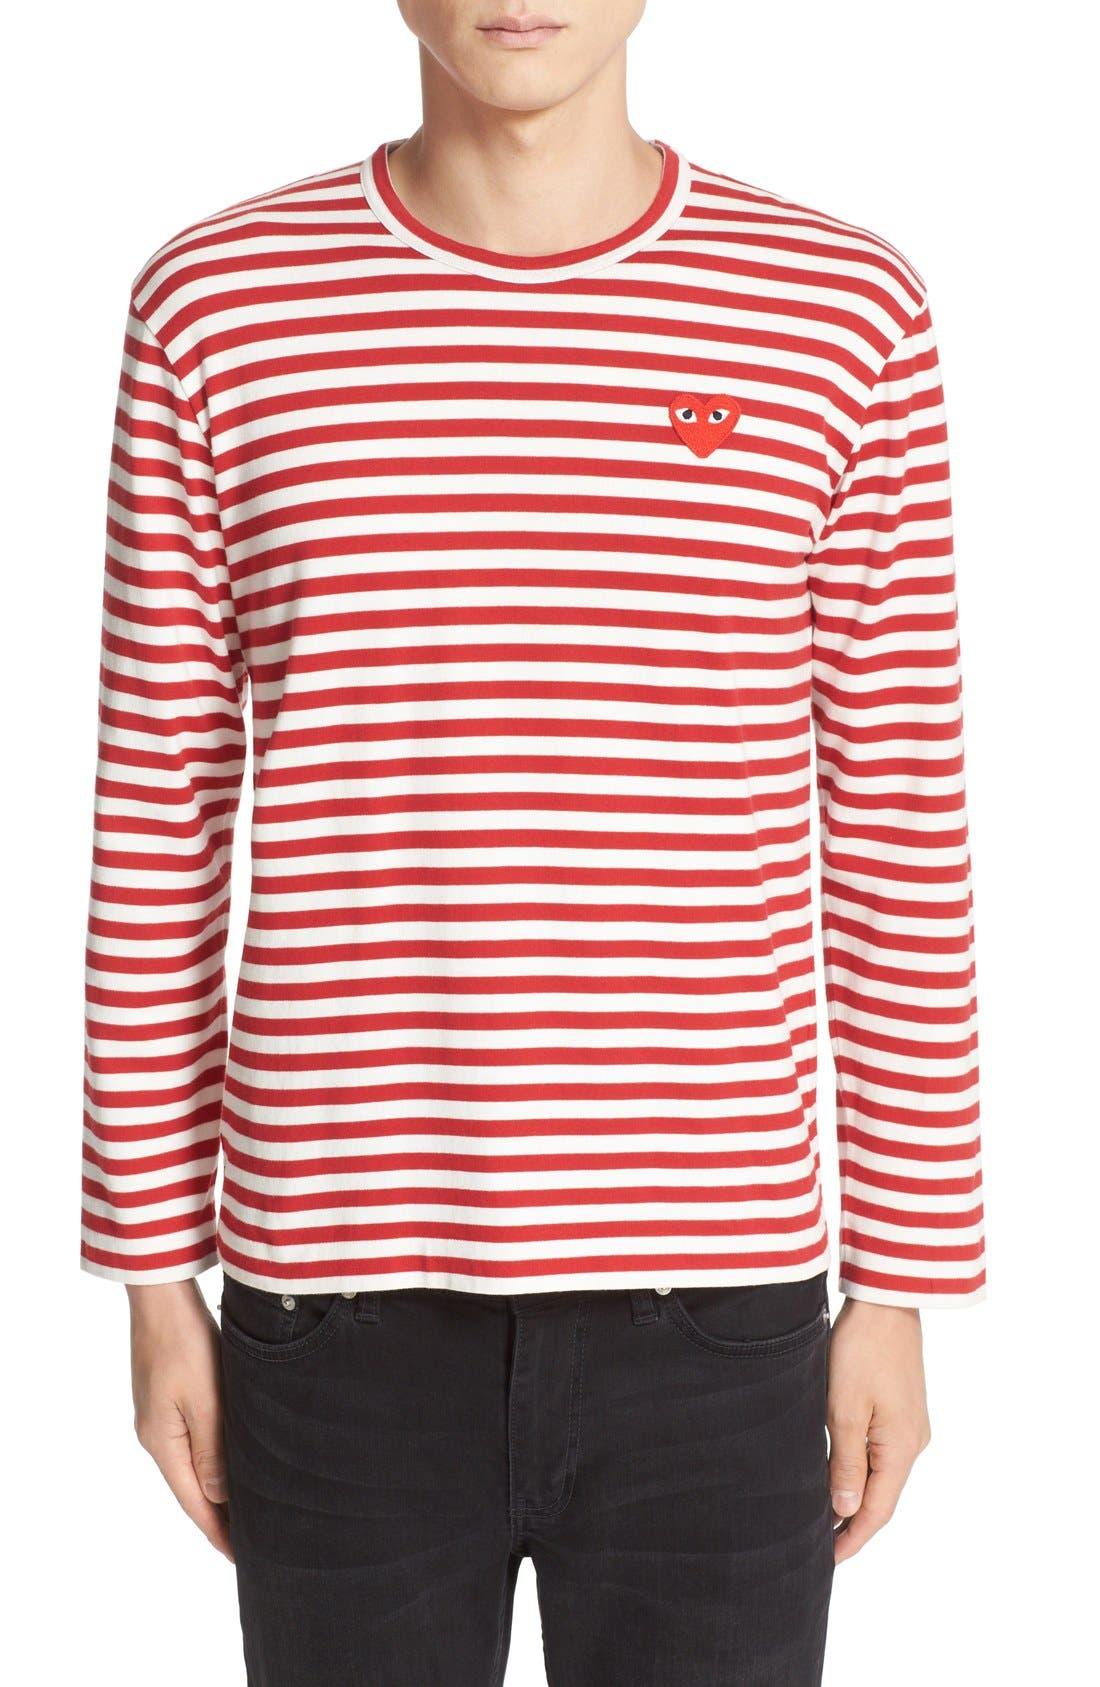 Comme des Garçons PLAY Stripe Long Sleeve T-Shirt,                             Main thumbnail 1, color,                             Red/ White